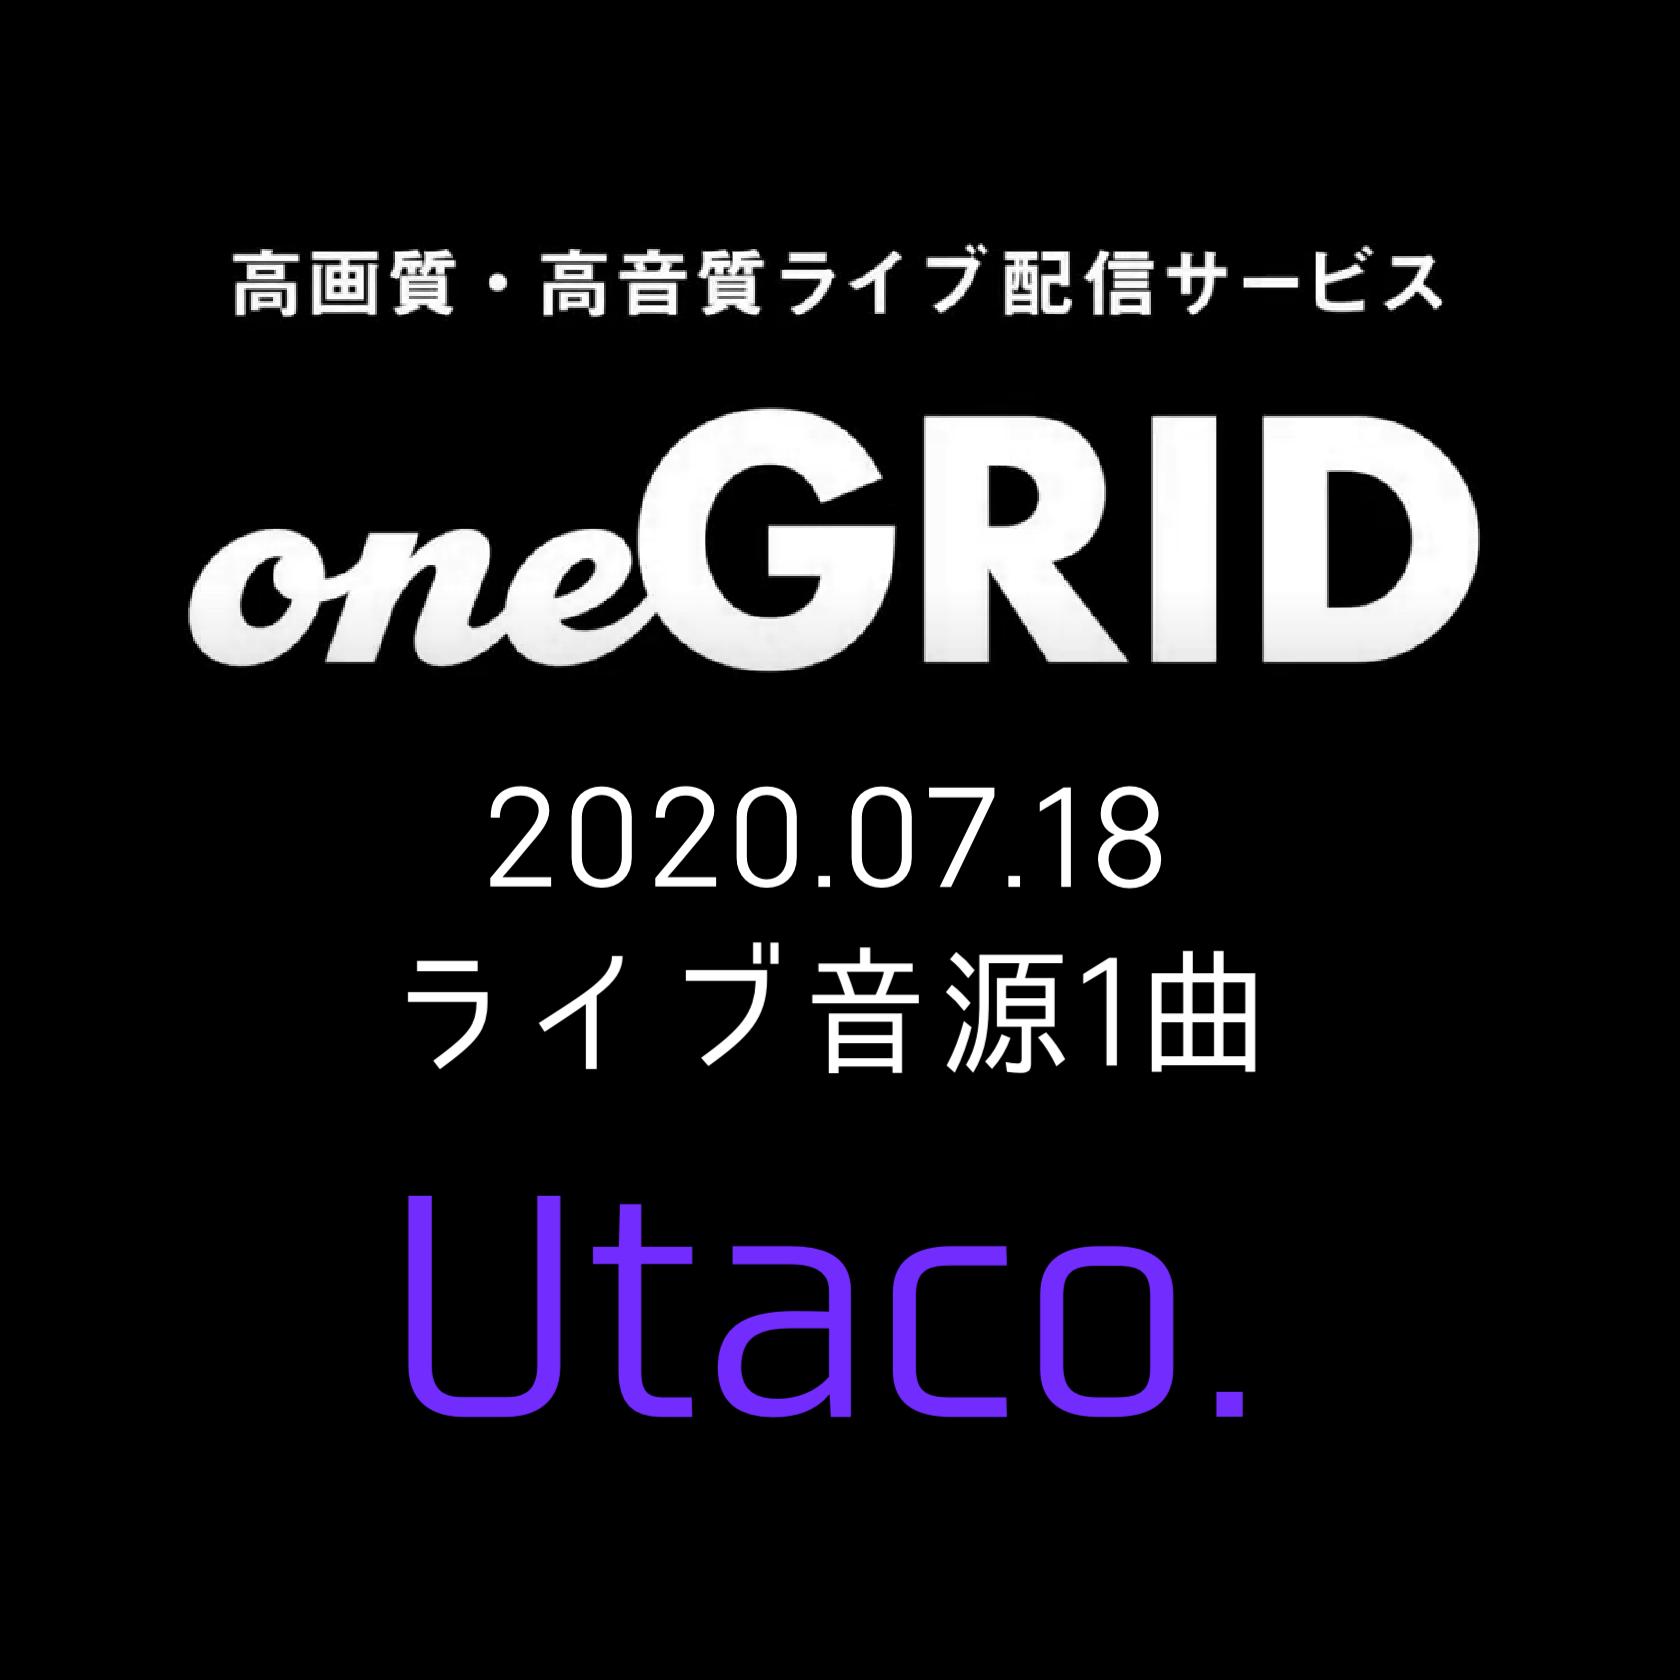 7/18Utaco.ライブ音源